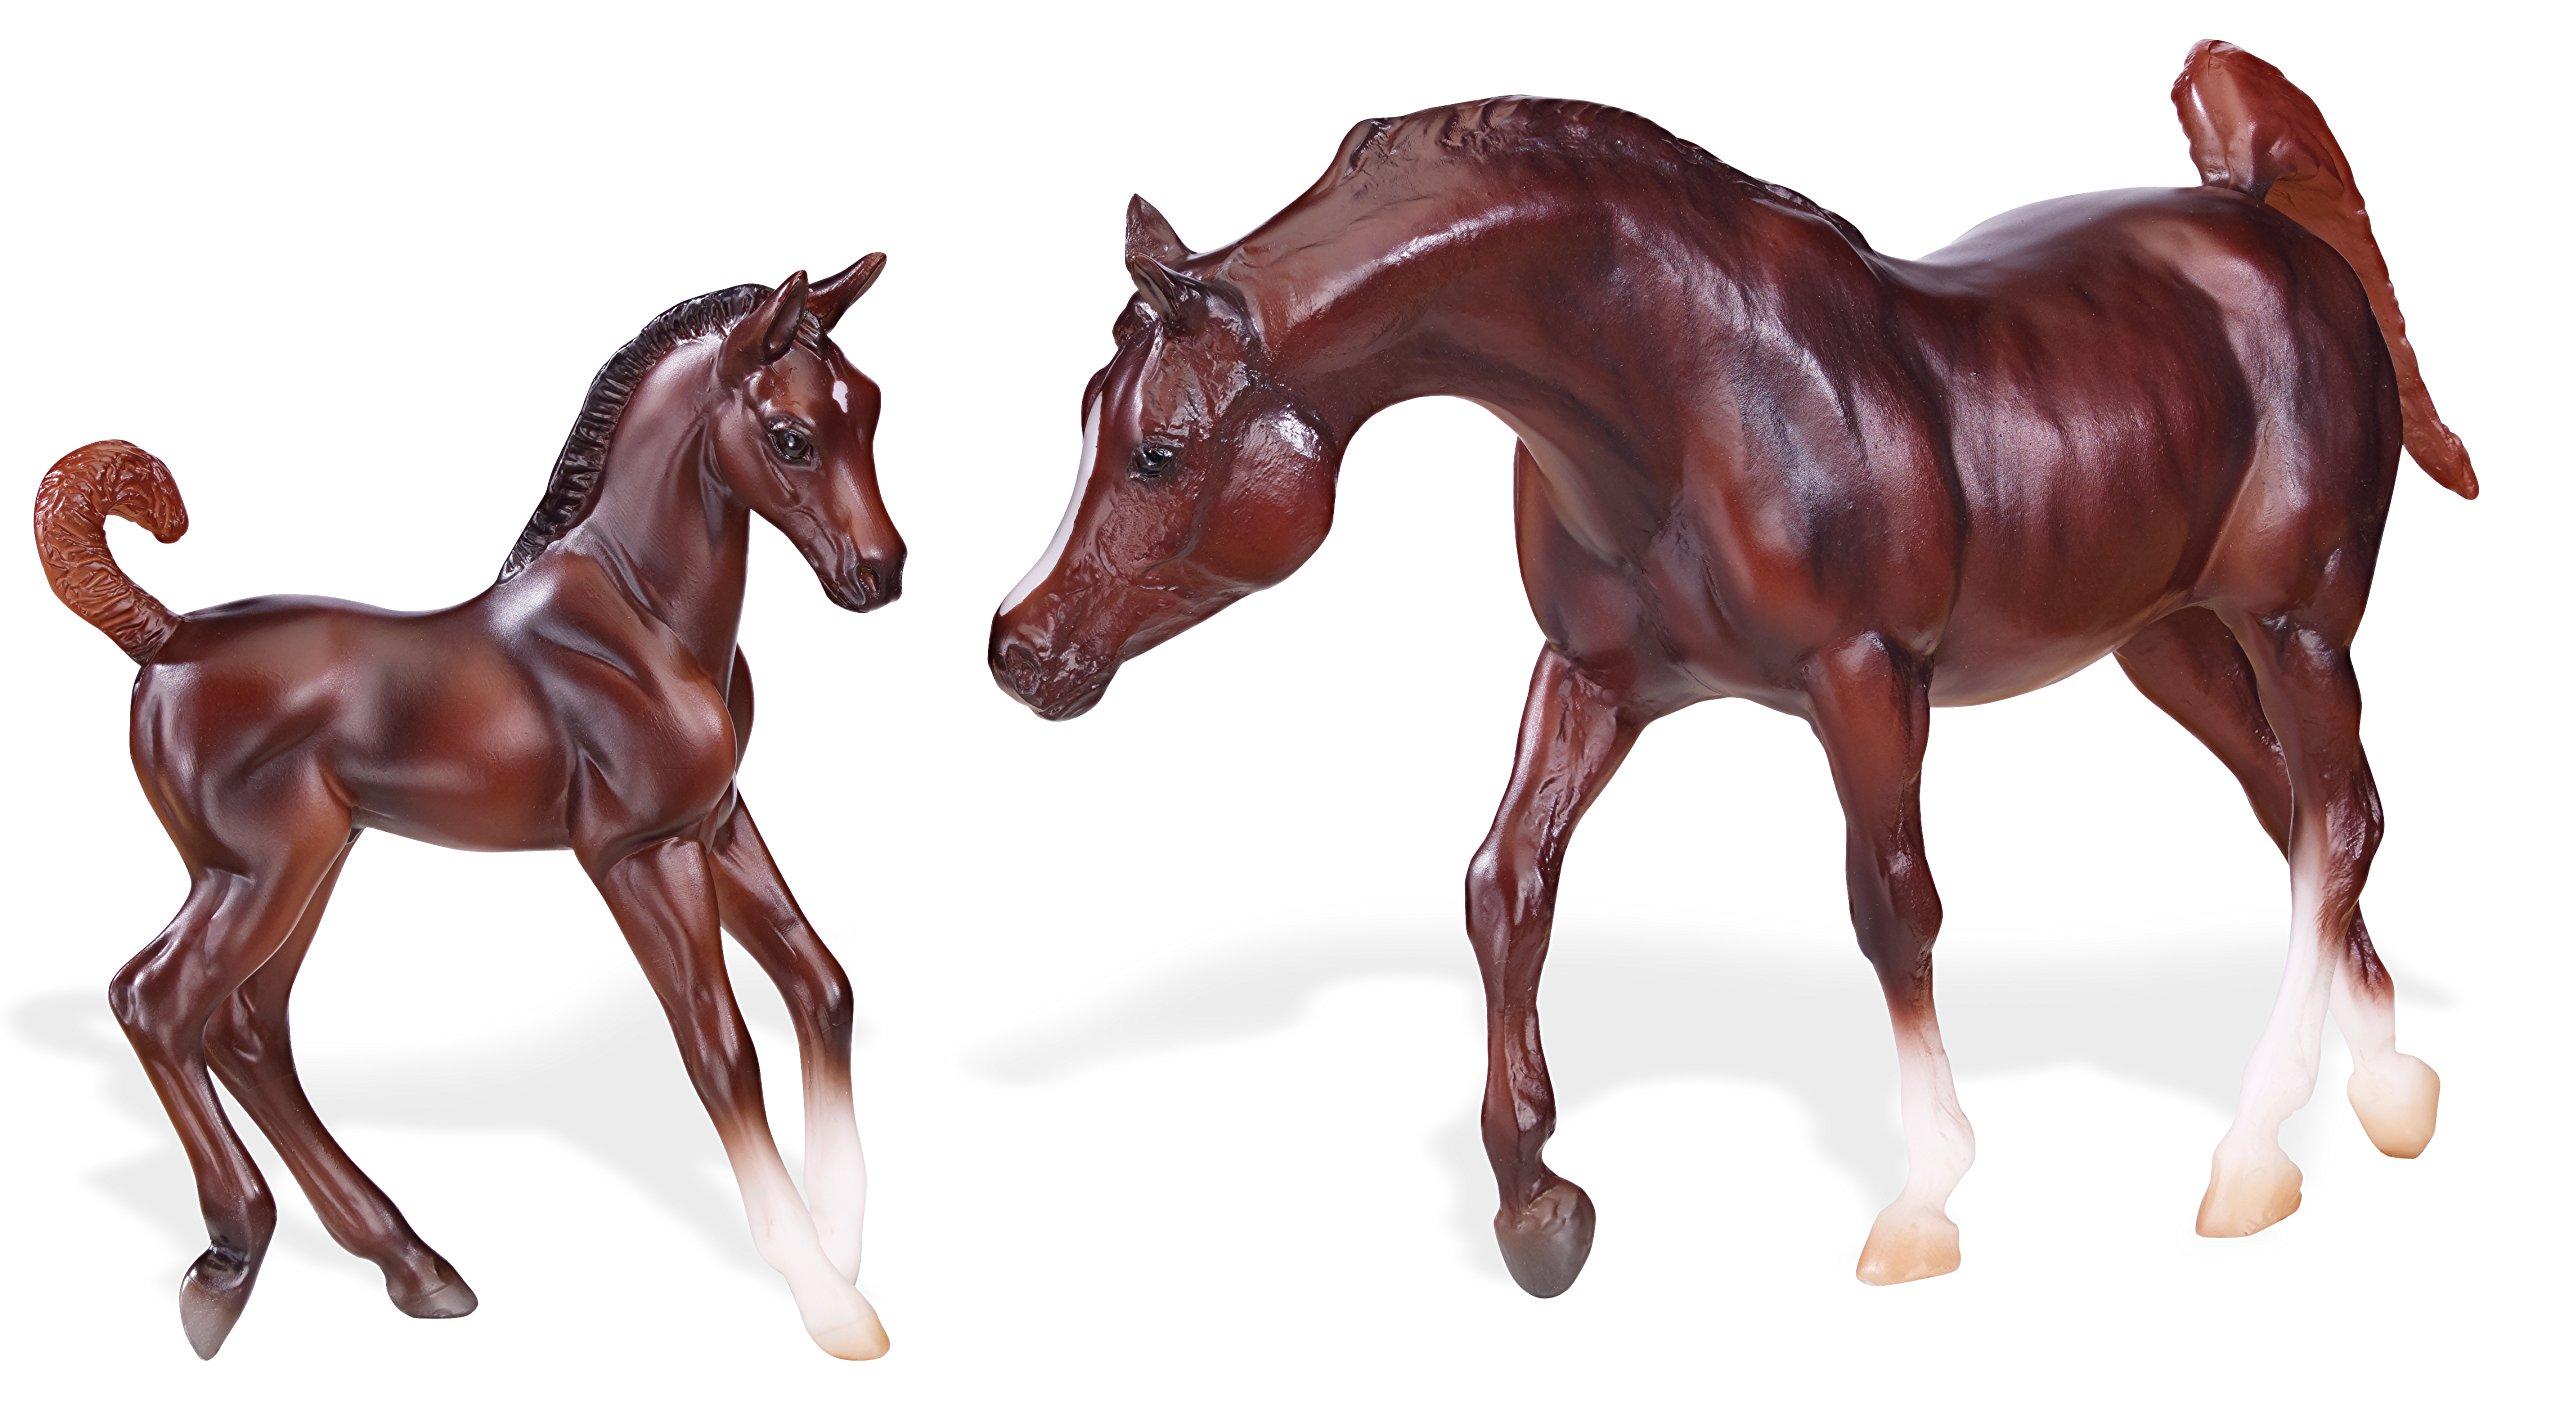 Dolls - Breyer Classics Chestnut Arabian Horse & Foal Toy ... - photo#13